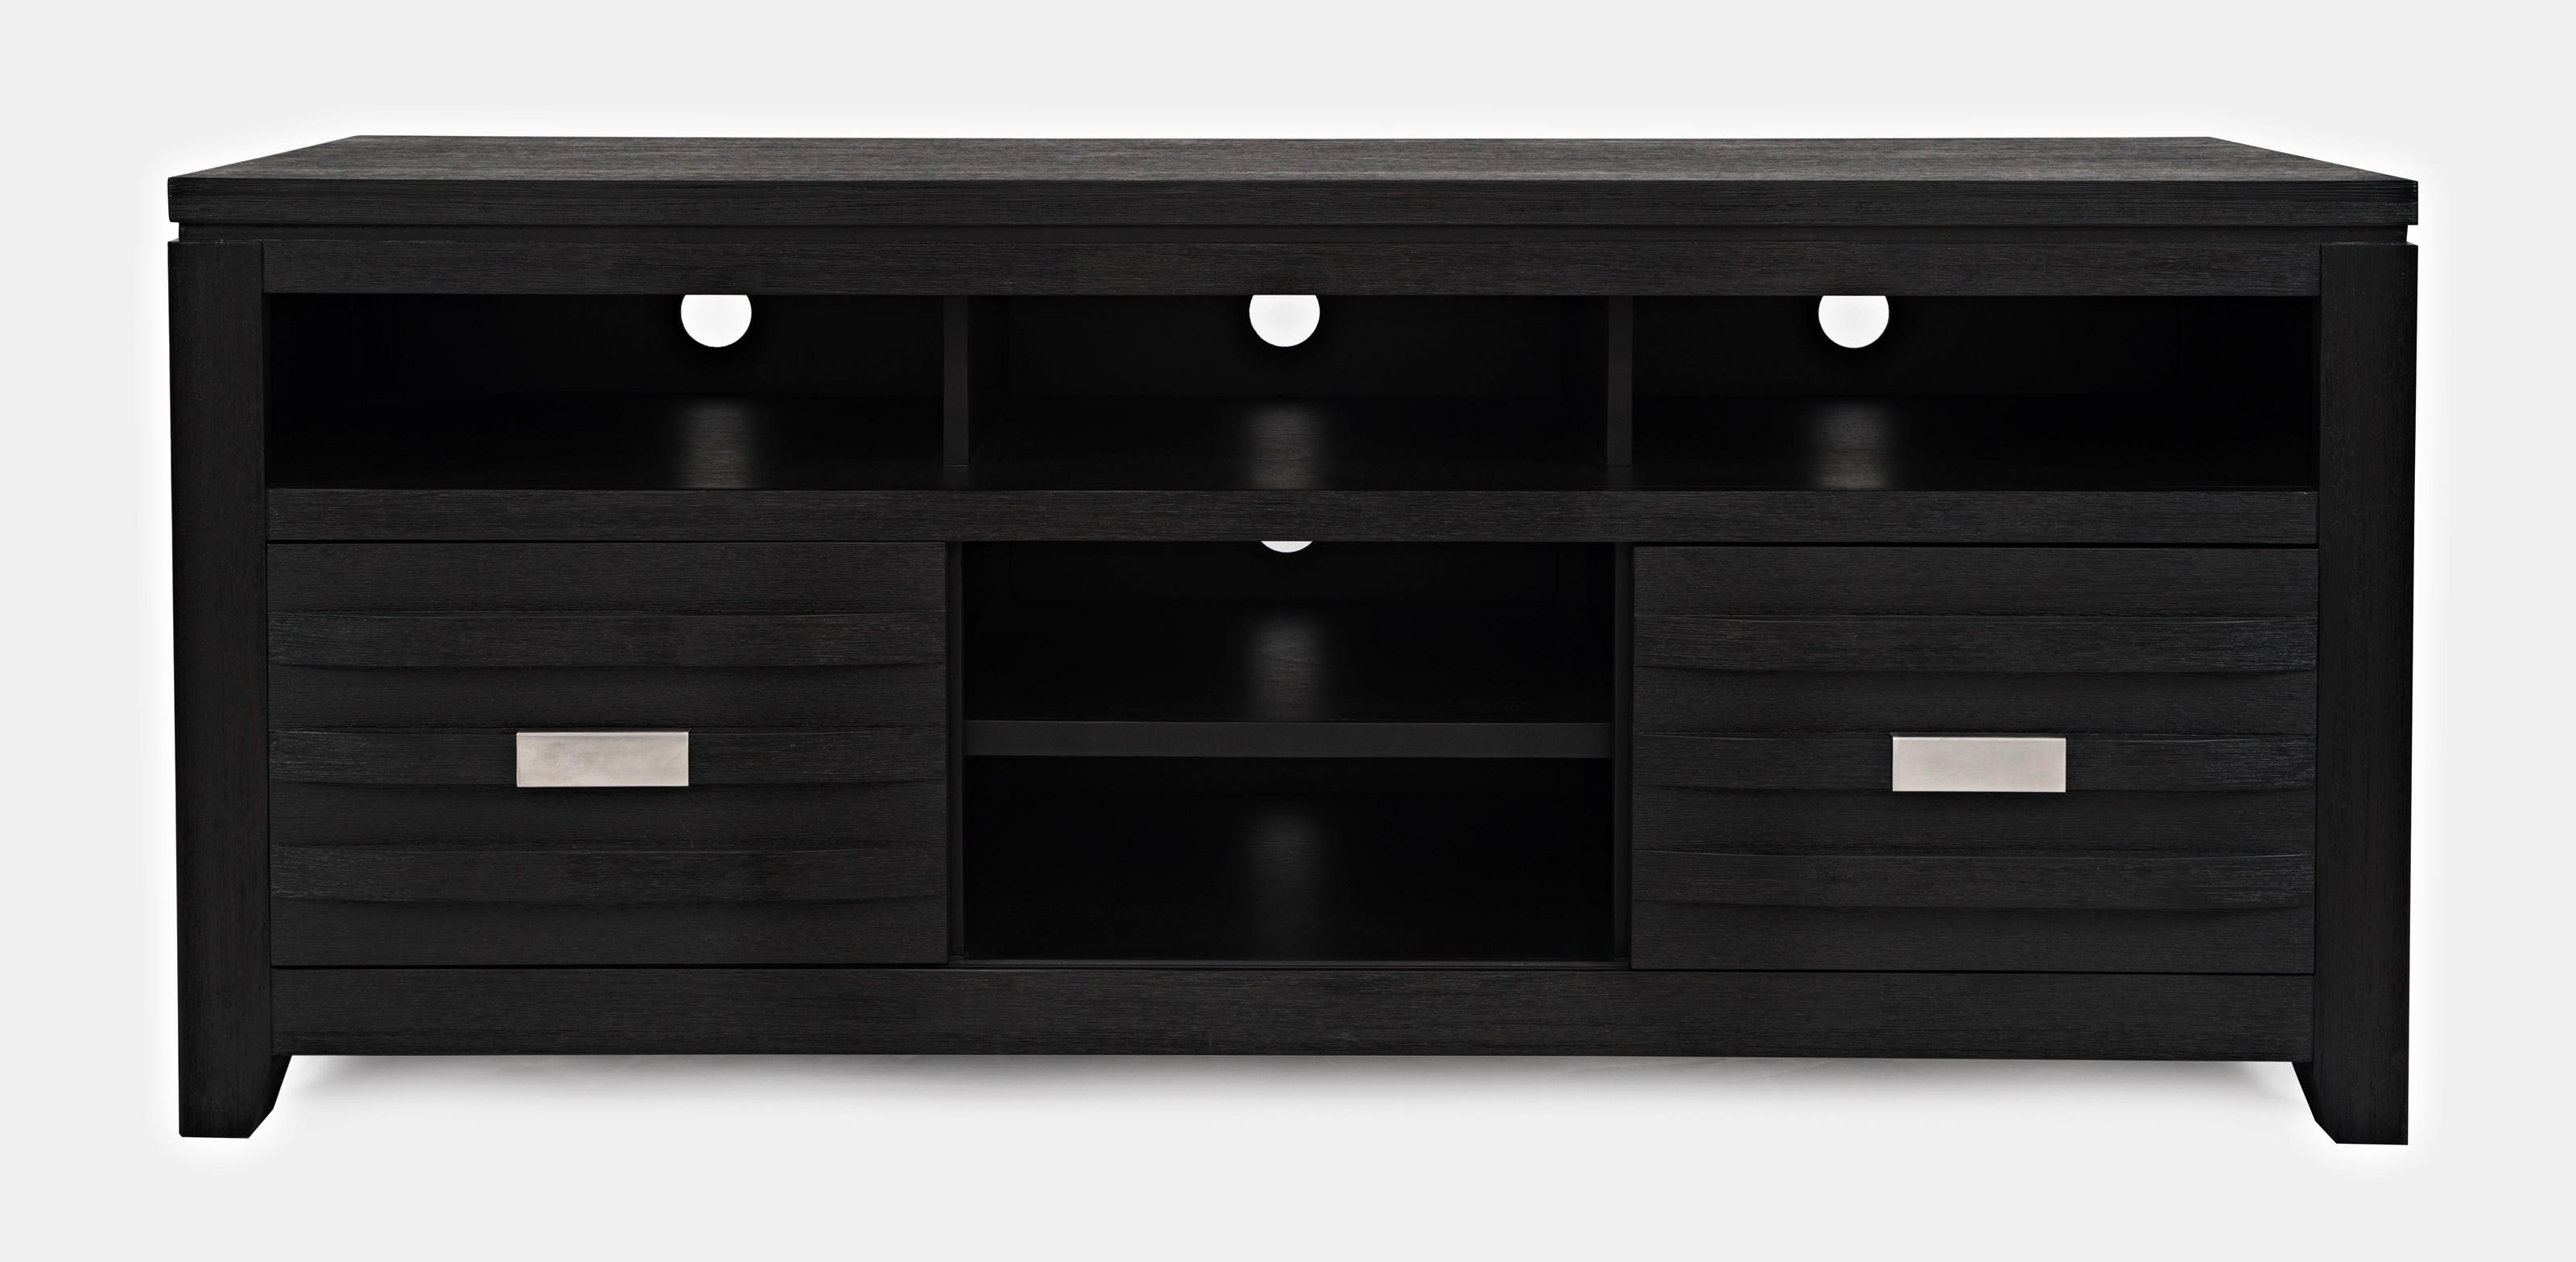 "Altamonte 60"" Console by Jofran at Lapeer Furniture & Mattress Center"